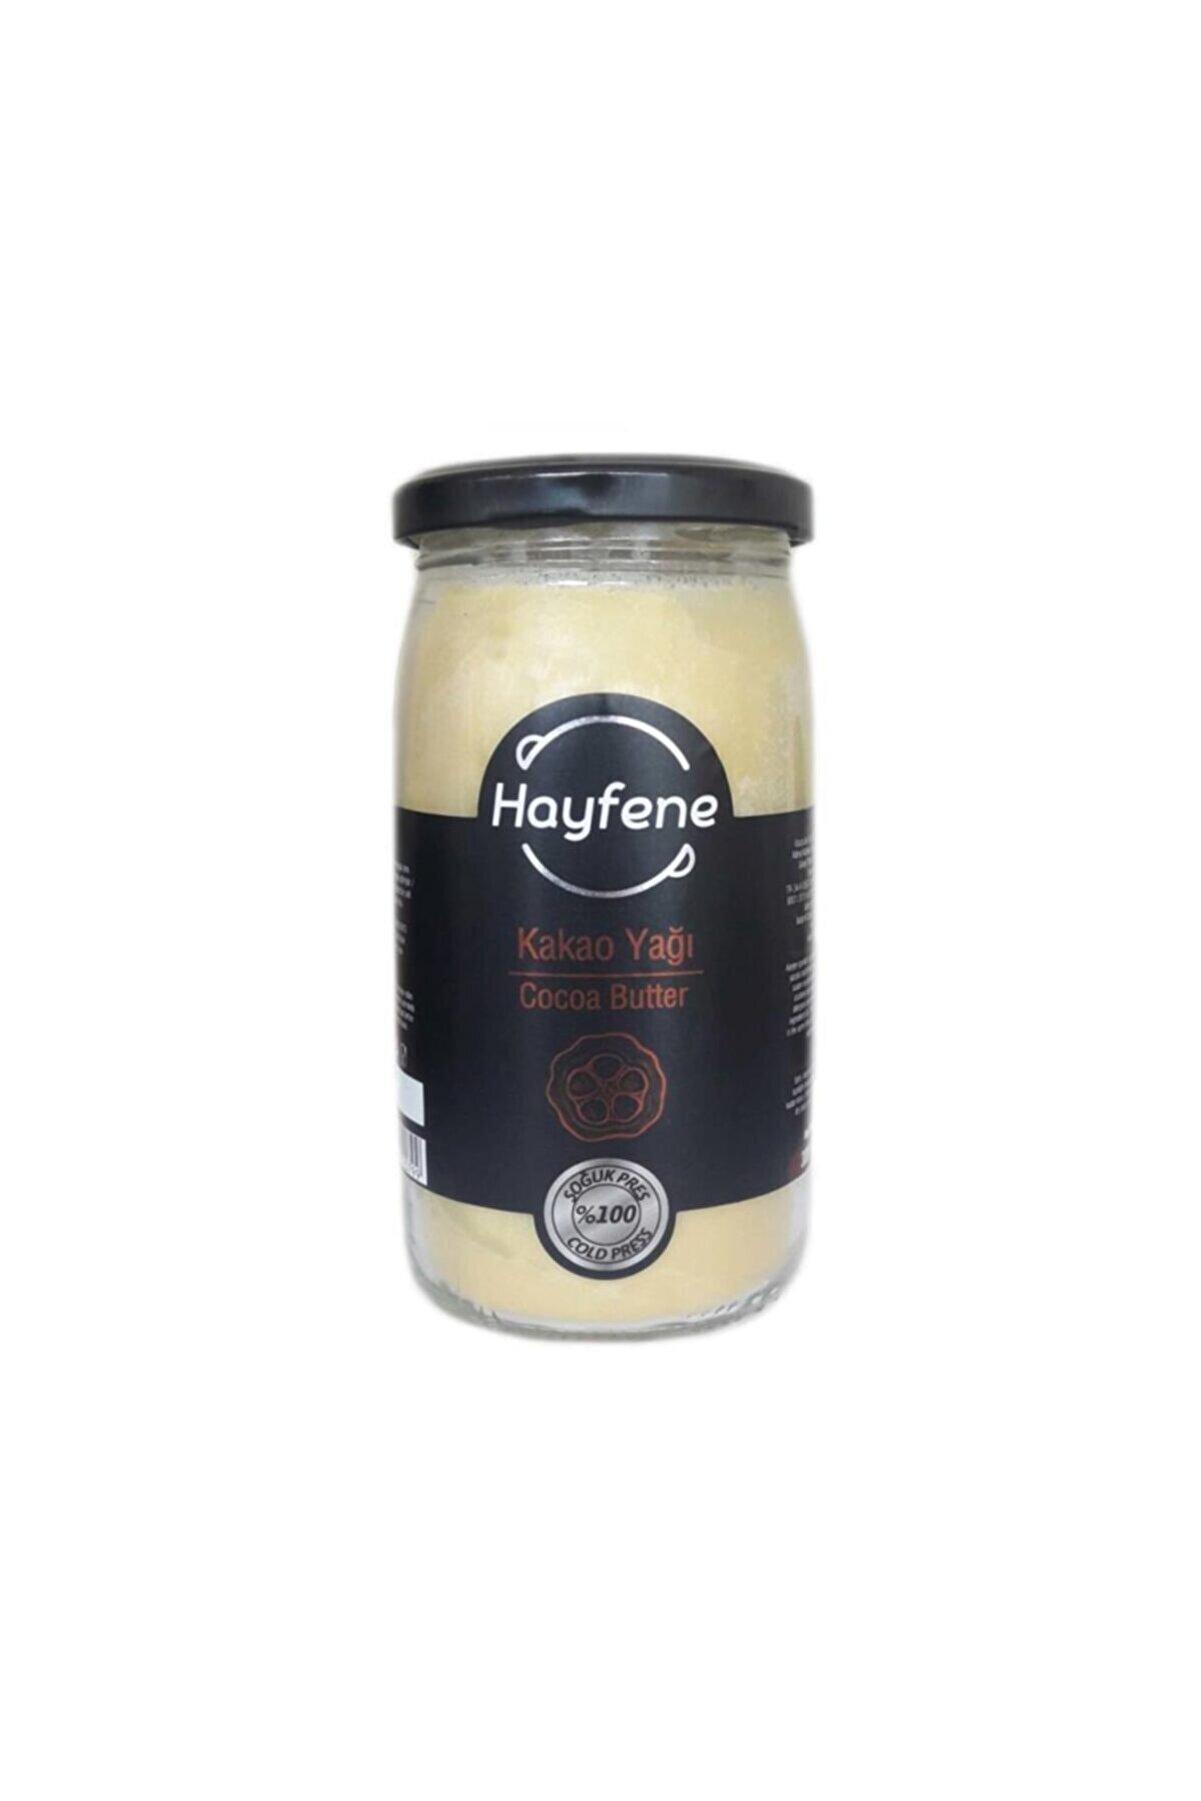 Hayfene Kakao Yağı (Katı) - Cocoa Butter - 300 gr